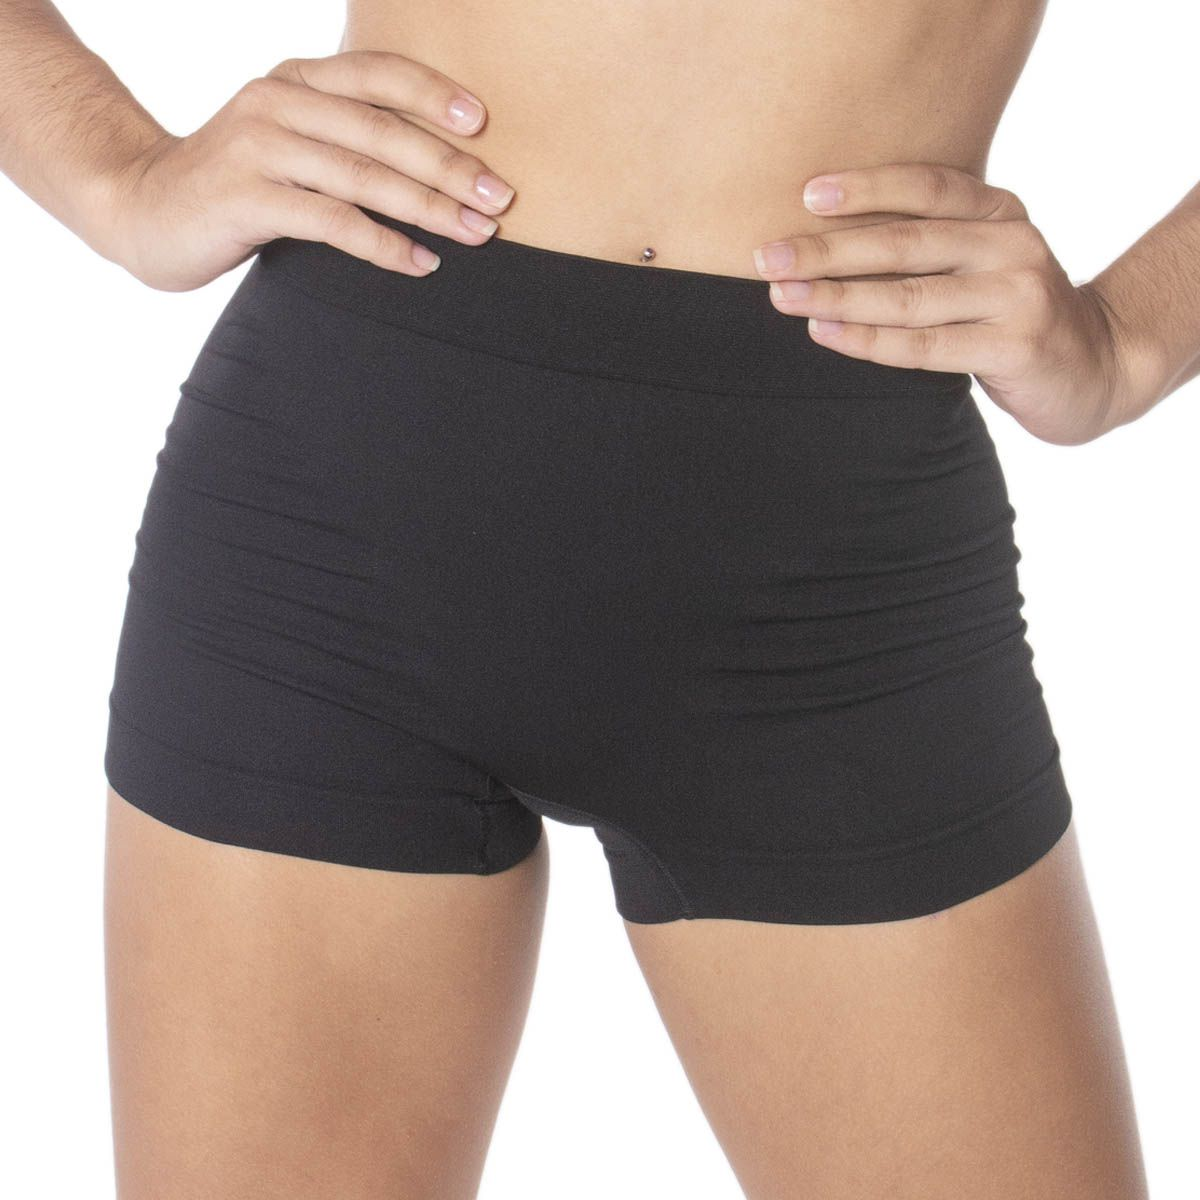 Calcinha Short Feminina Bumbum Perfeito Modelo Boxer Trifil